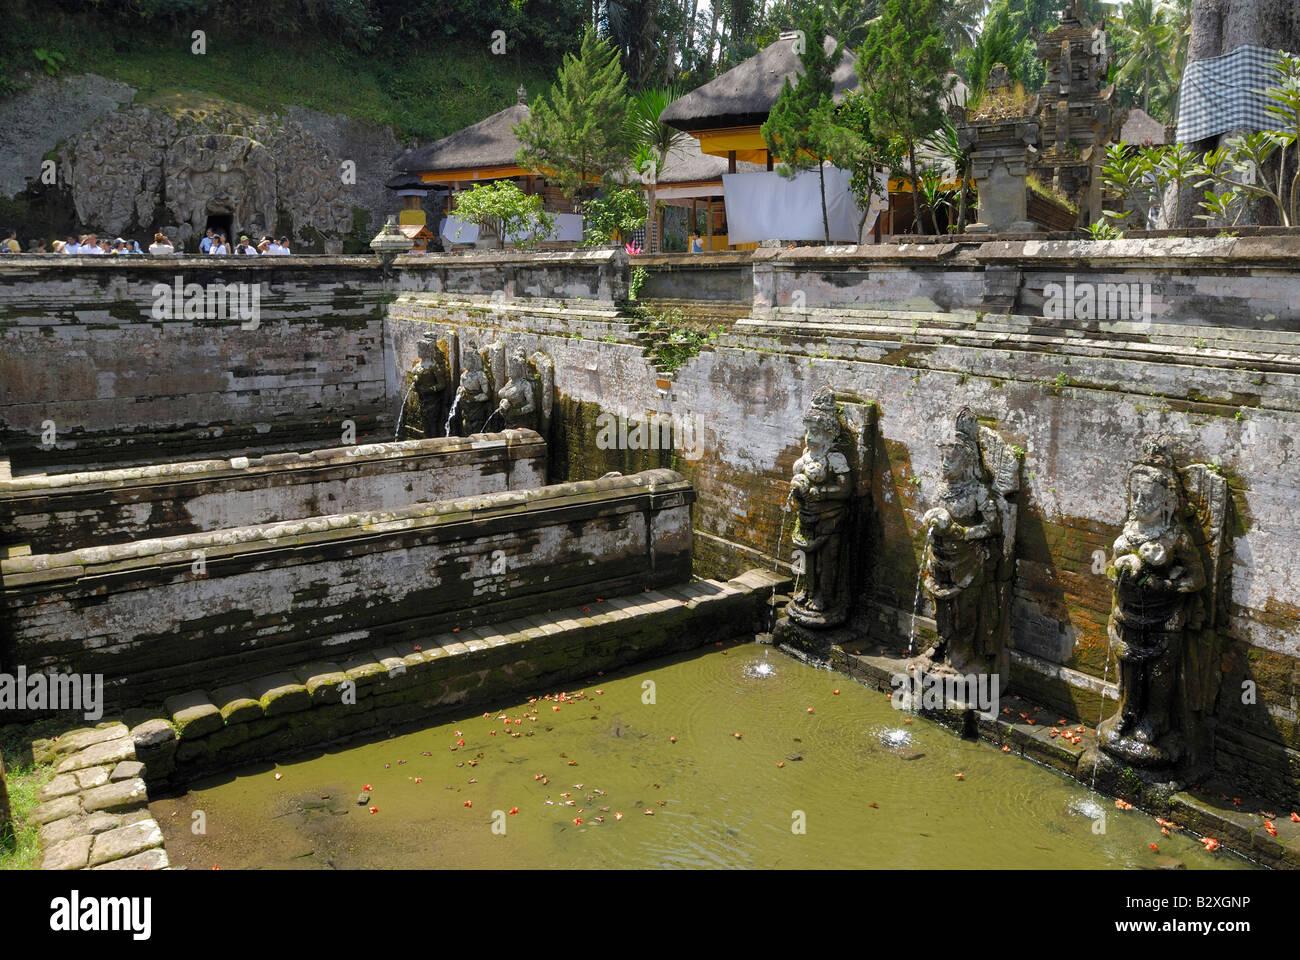 Badeplatz der Nymphen, ELEFANTENHÖHLE Goa Gajah, Bali, Indonesien, Asien Stockbild